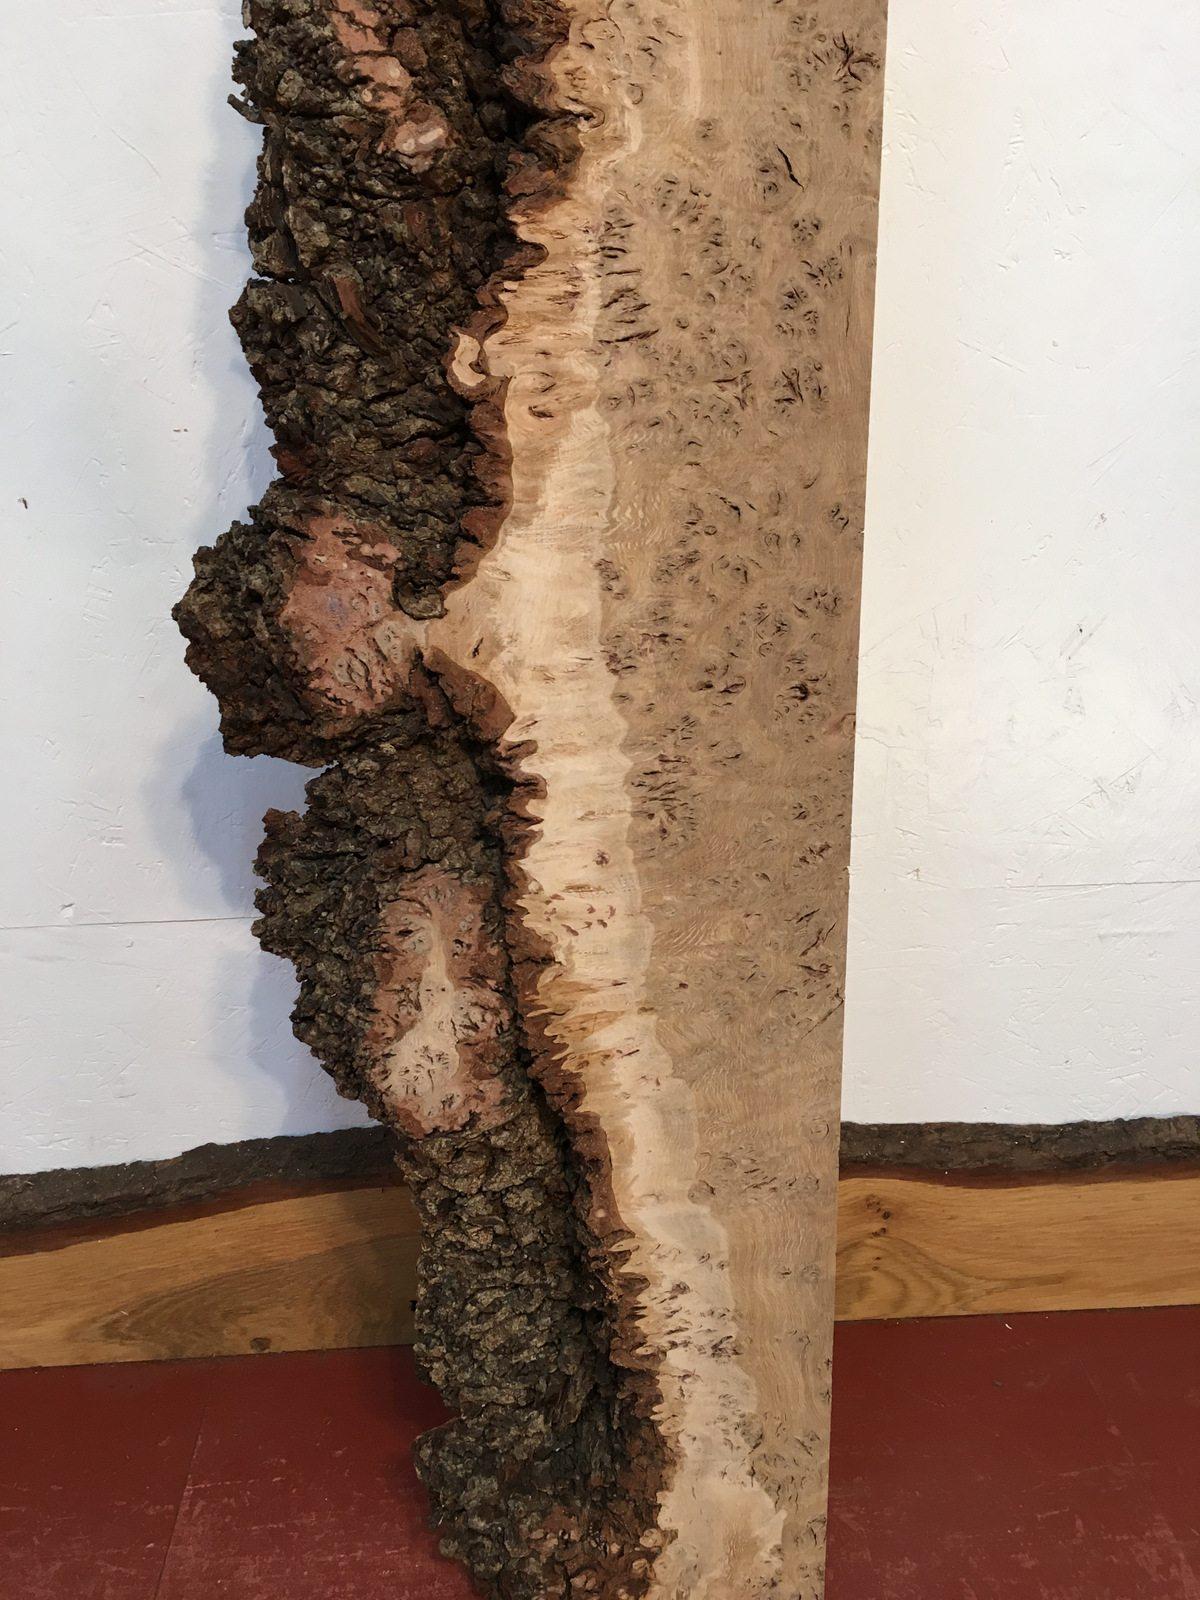 burr oak singles & personals Press to search craigslist  favorite this post jun 7 suzuki singles manual 77-80 $20 (burr oak, ks)  (burr oak,ks) pic.